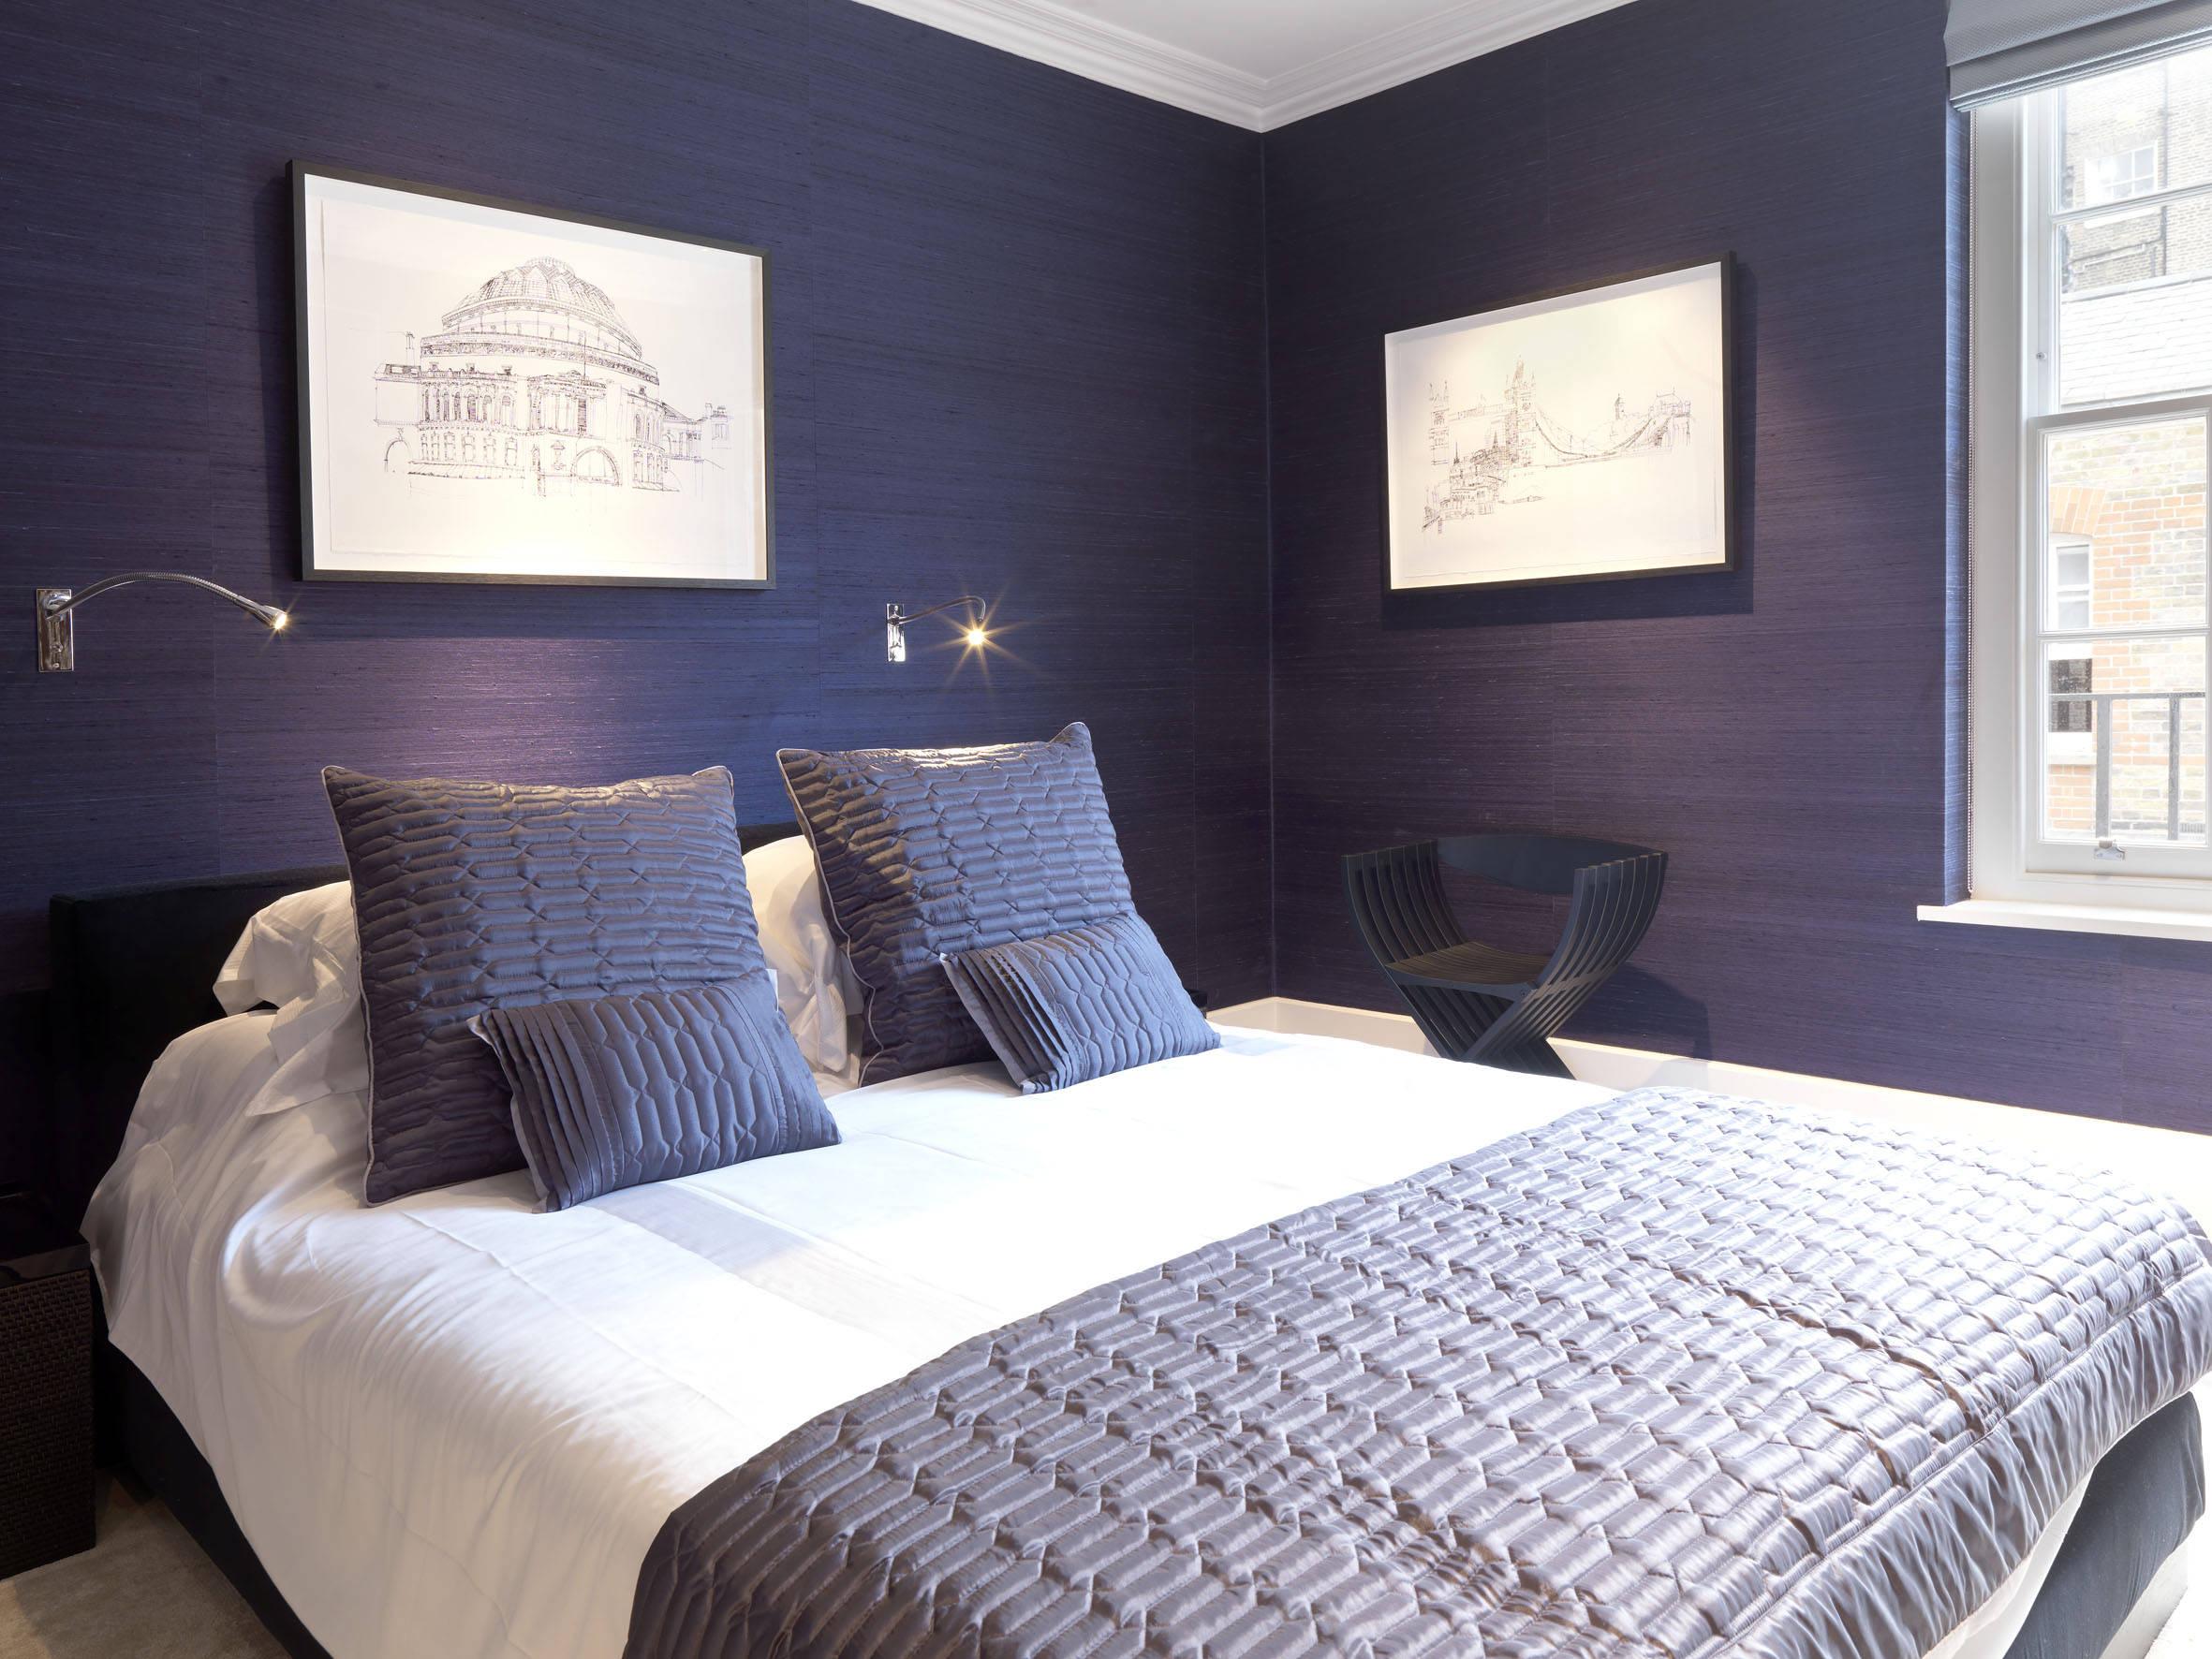 75 Beautiful Purple Bedroom Pictures Ideas April 2021 Houzz